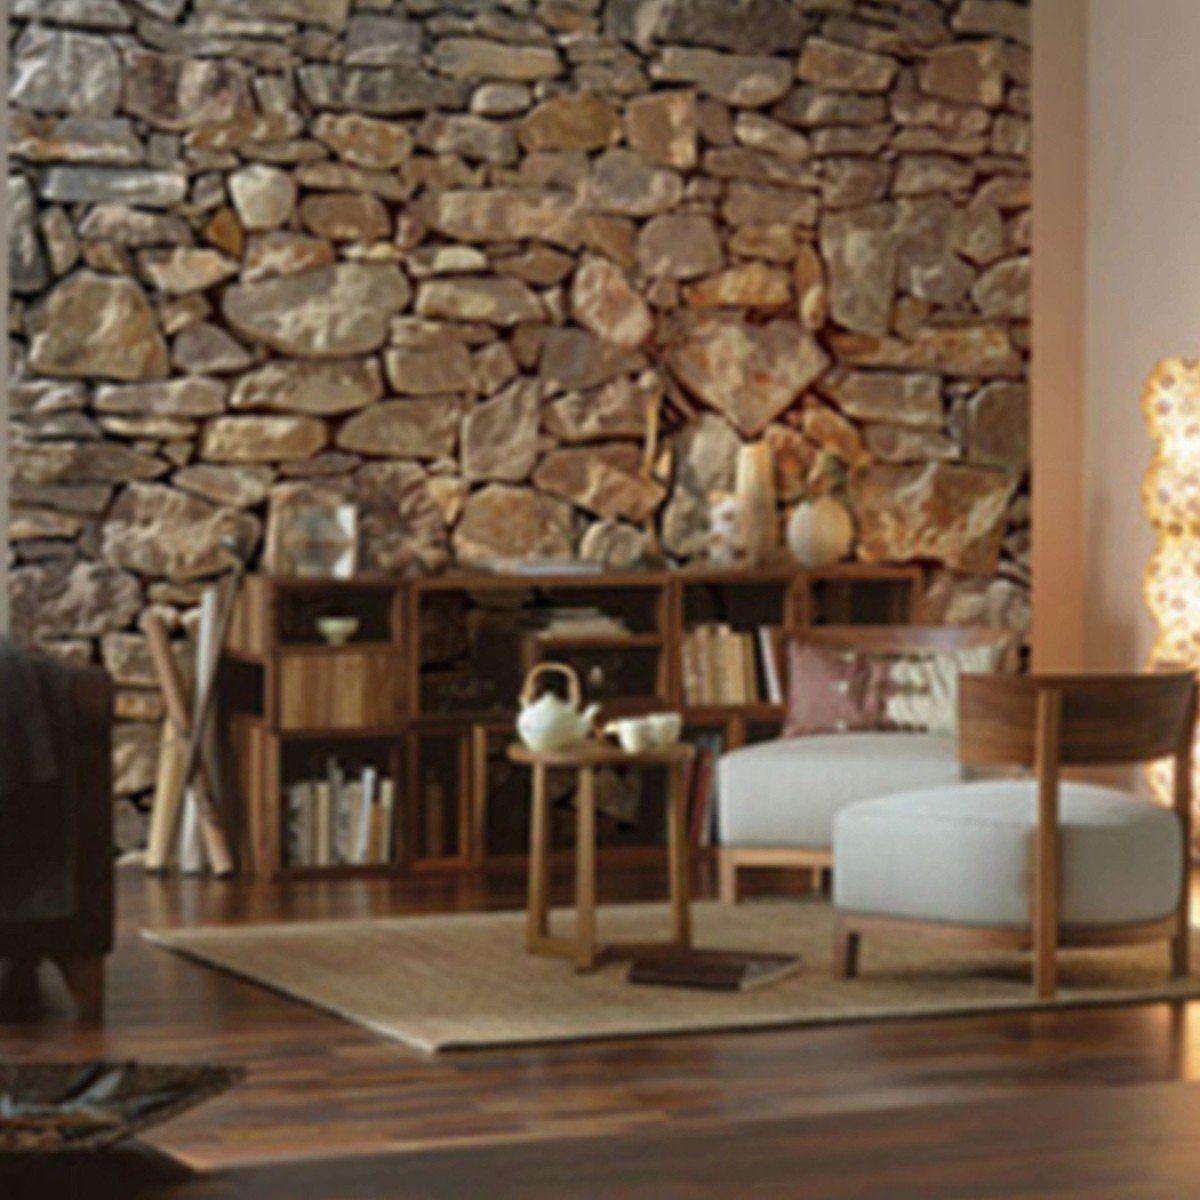 Einfaches hausdesign 2018 stone wall  haus  pinterest  wall murals wall und home decor